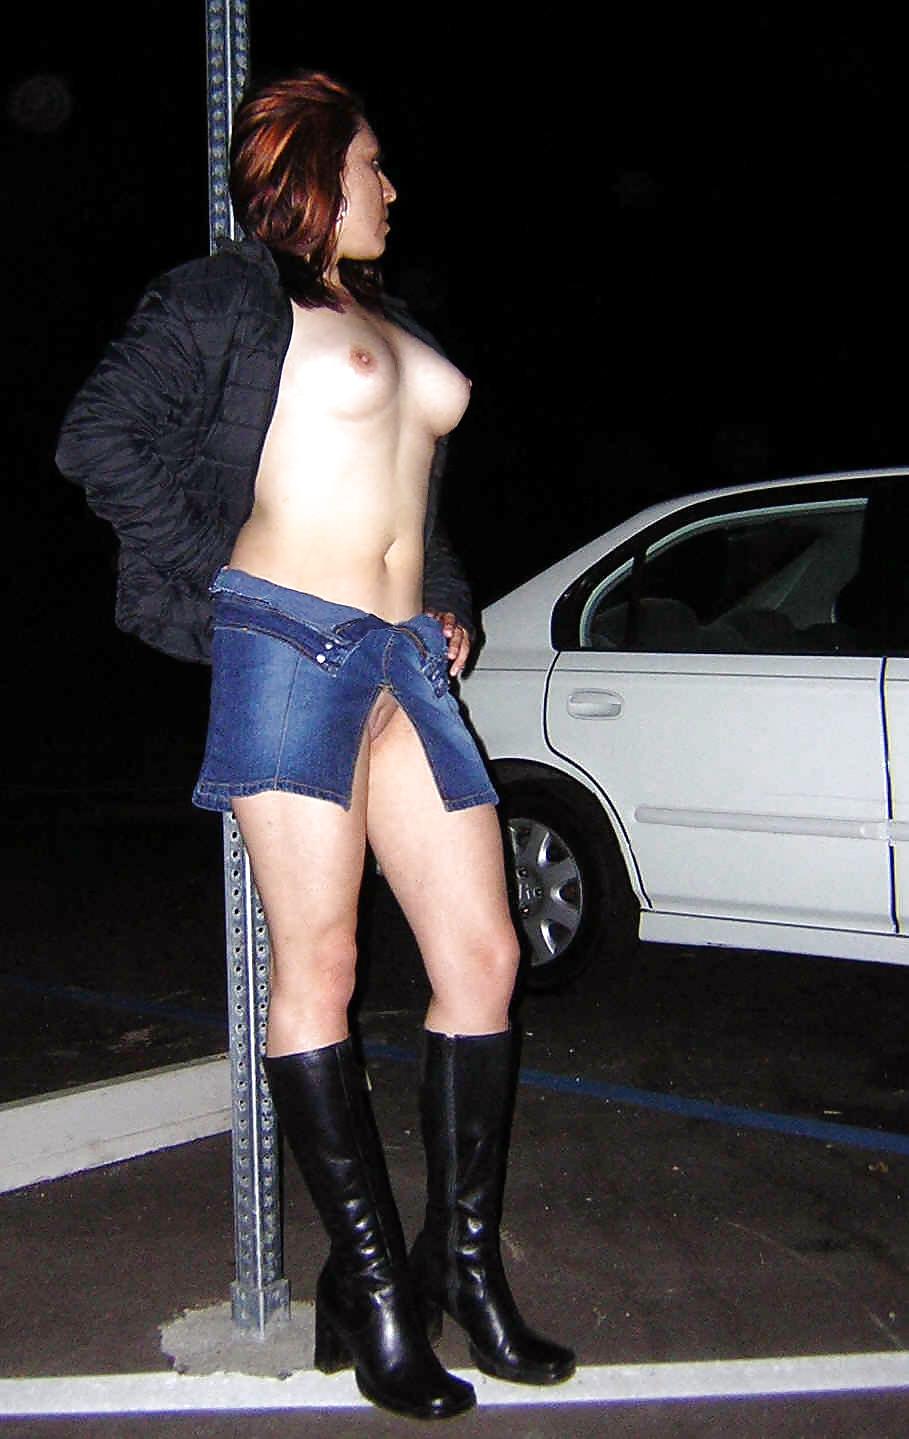 Trashy old street slut pics sex